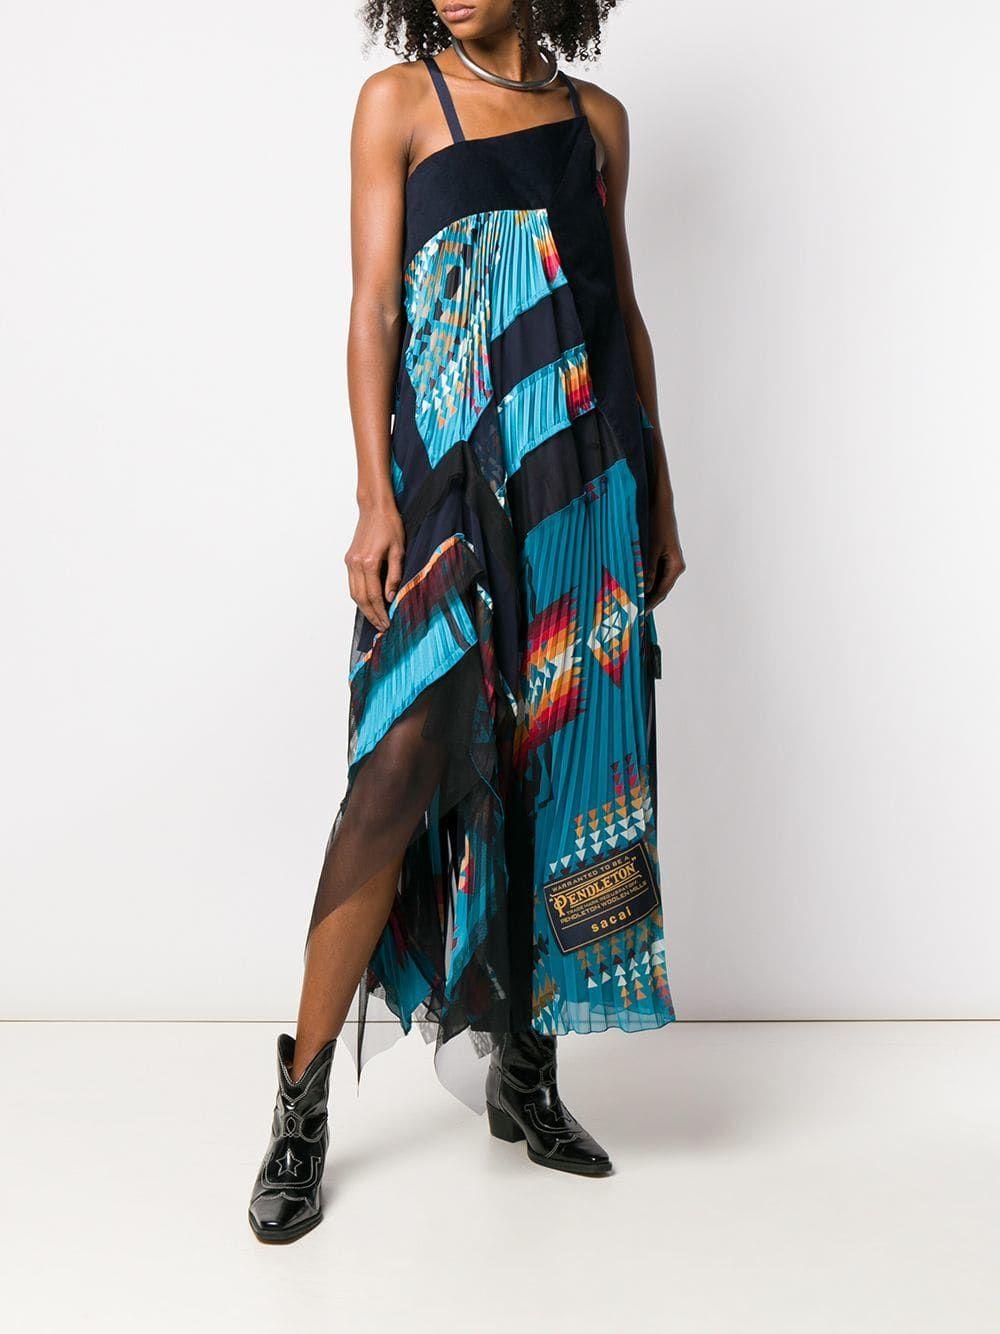 48b15e3302f Sacai Southwest-inspired Dress - Farfetch